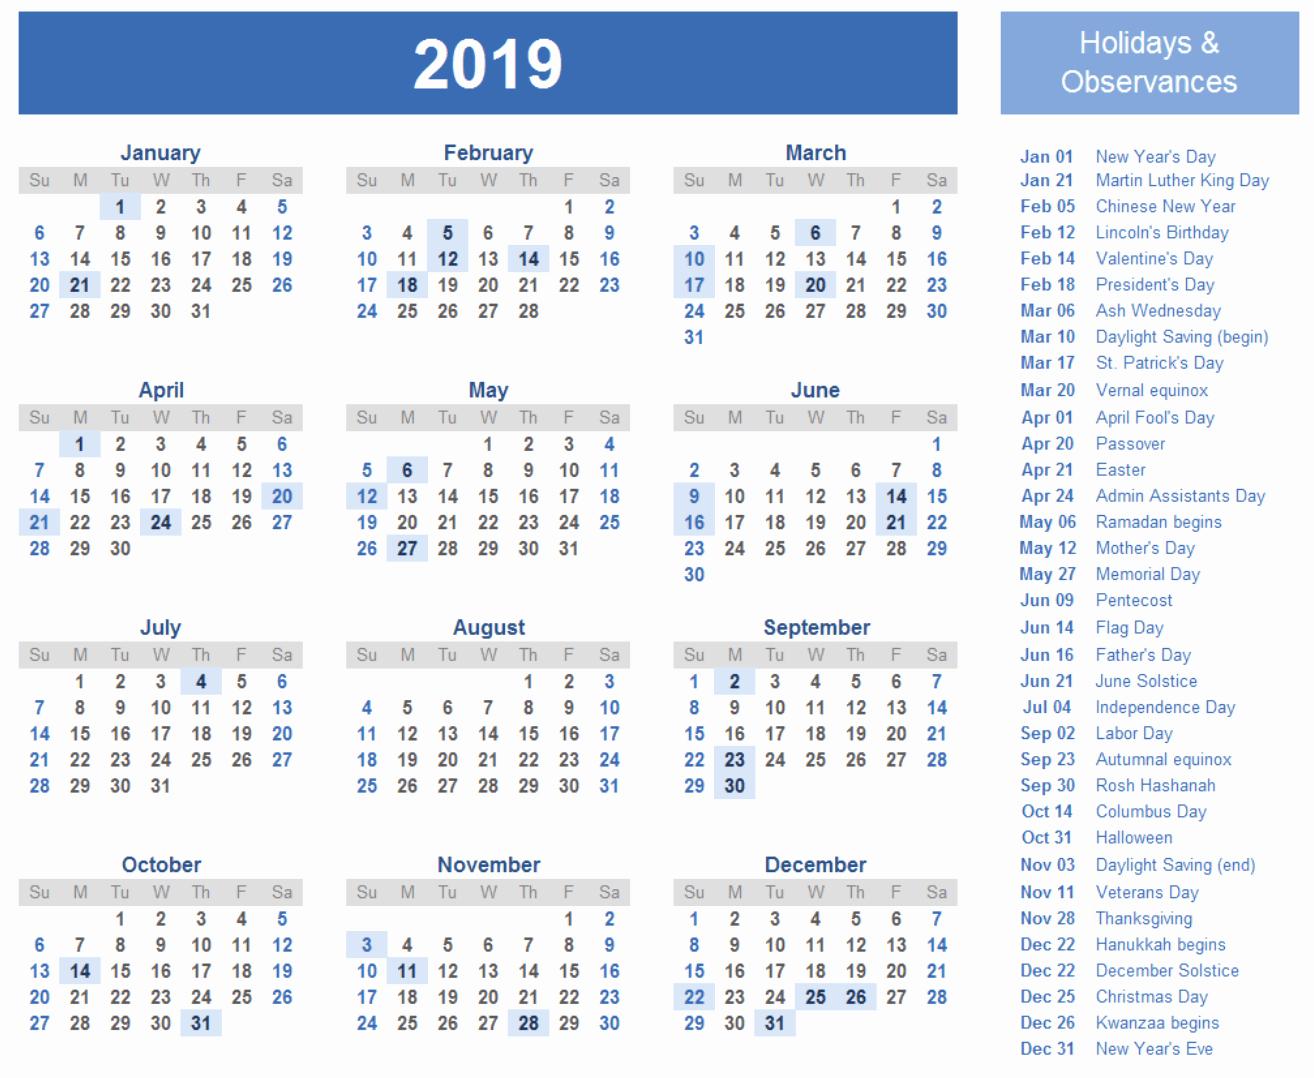 Free 2019 Calendar Template Beautiful 2019 Calendar Amazonaws